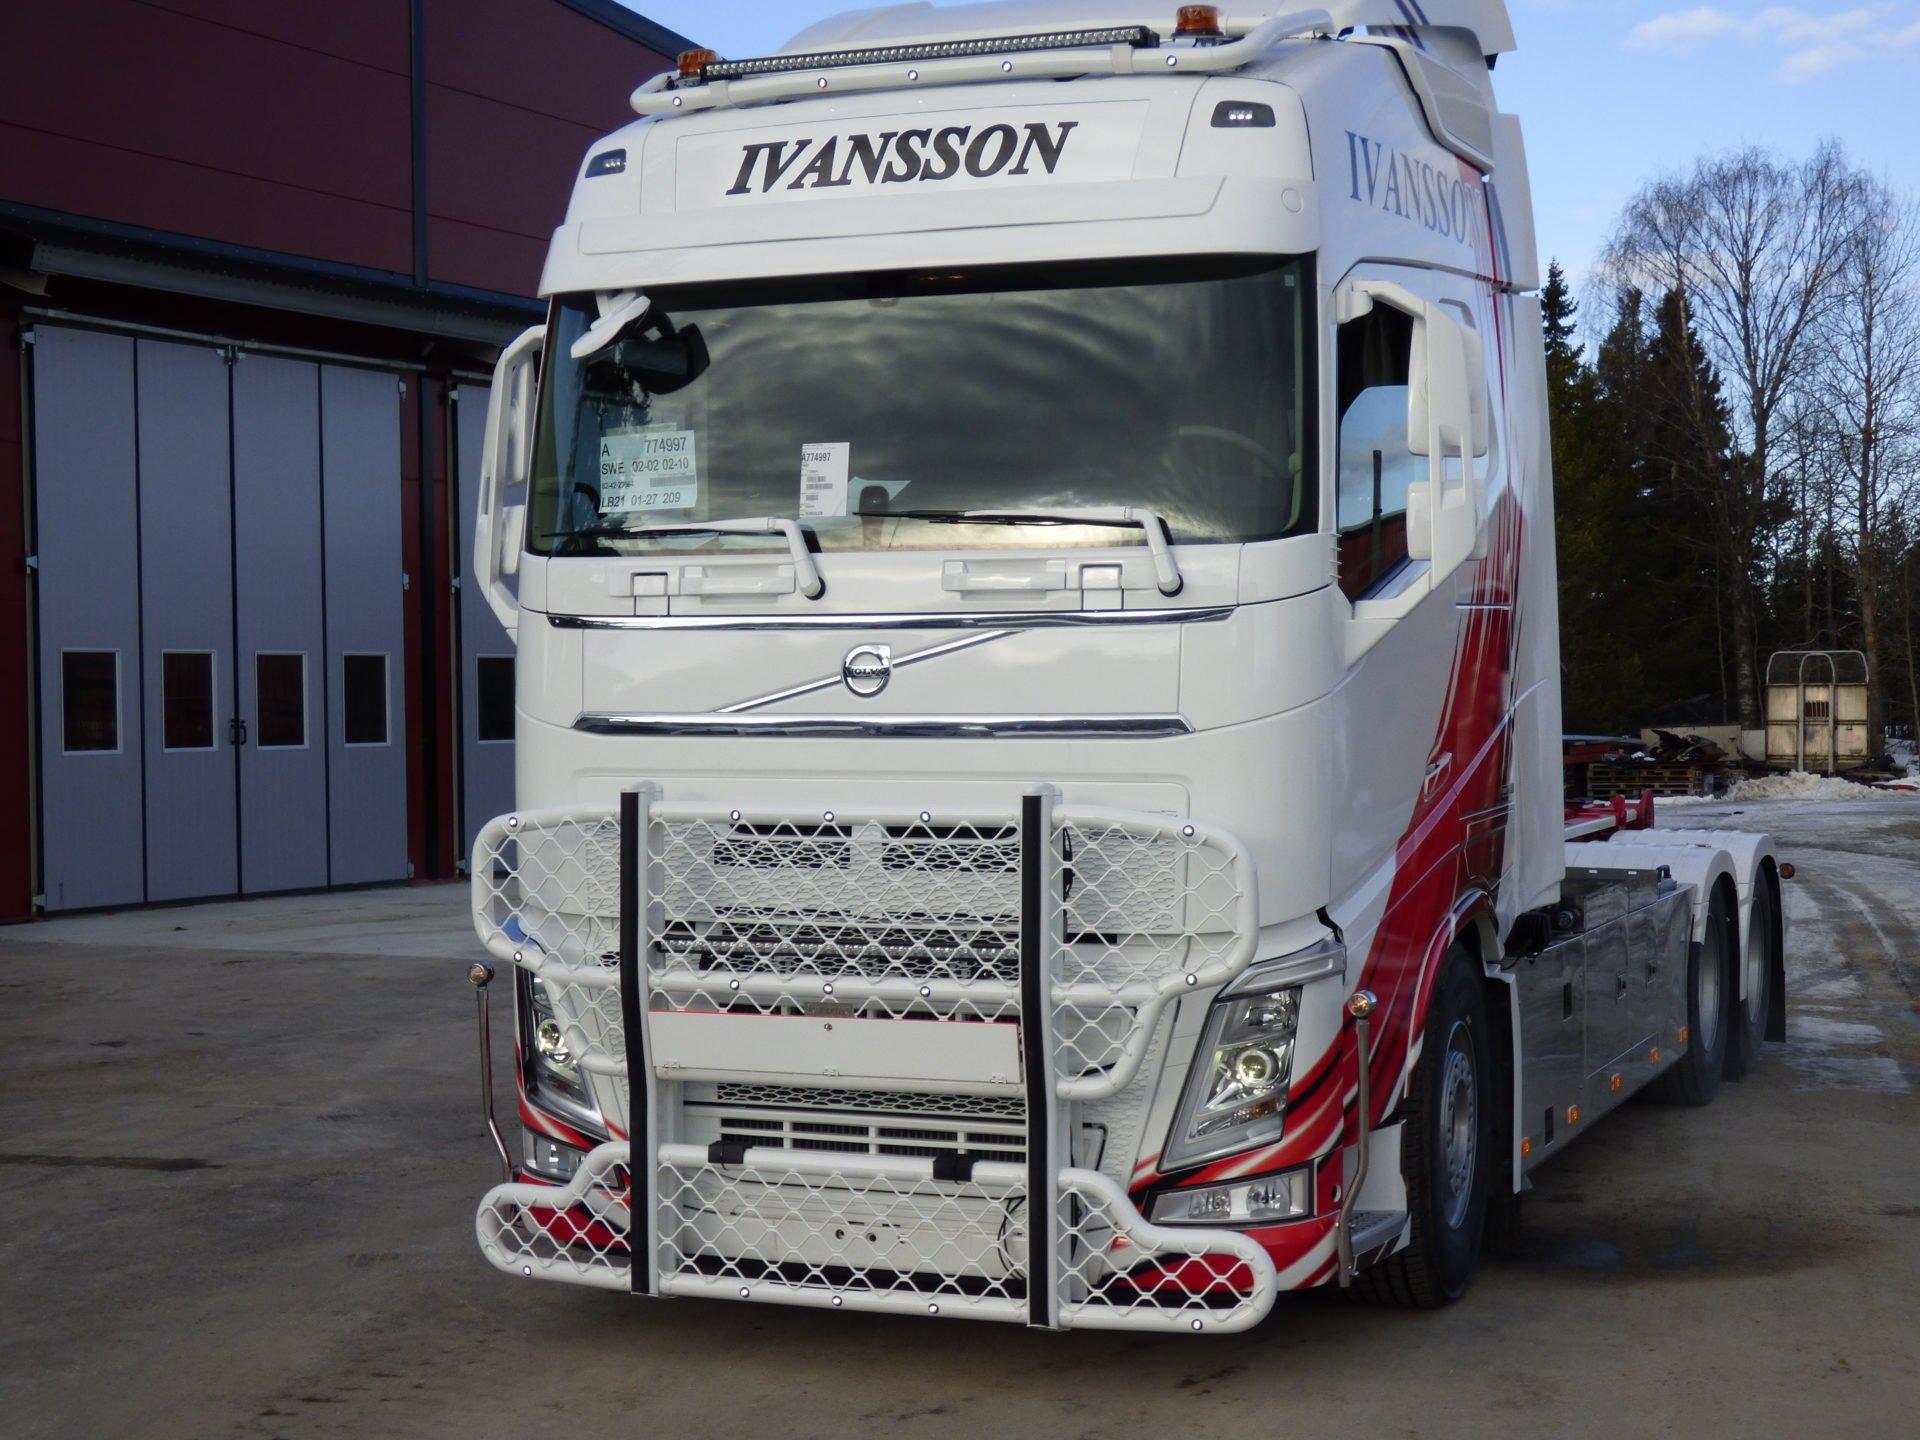 1512451 Ivansson (3)